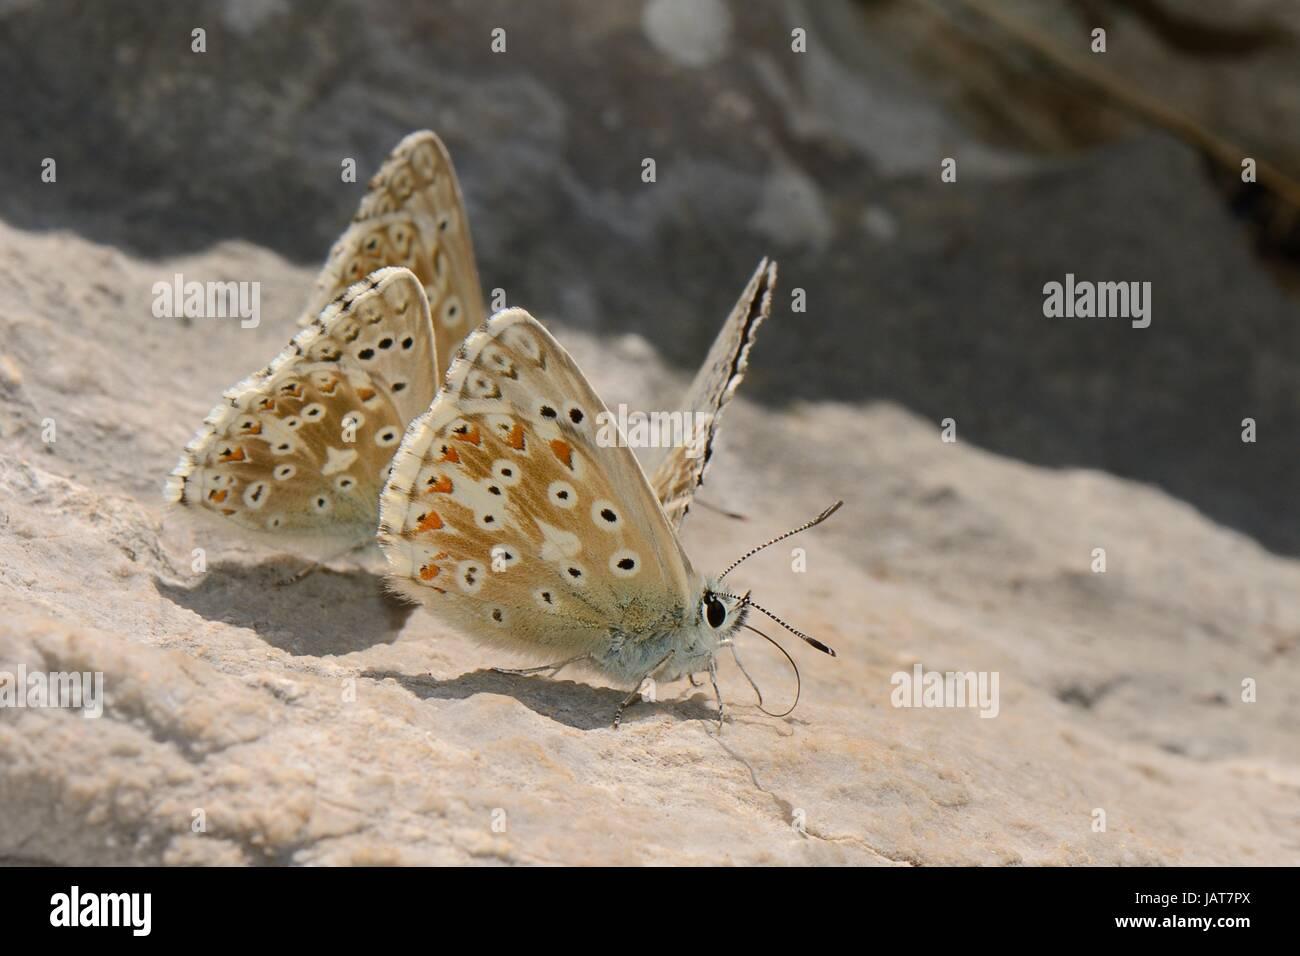 Group of male Chalkhill blue butterflies (Polyommatus coridon) gathering salts from a rock, Picos de Europa mountains, - Stock Image